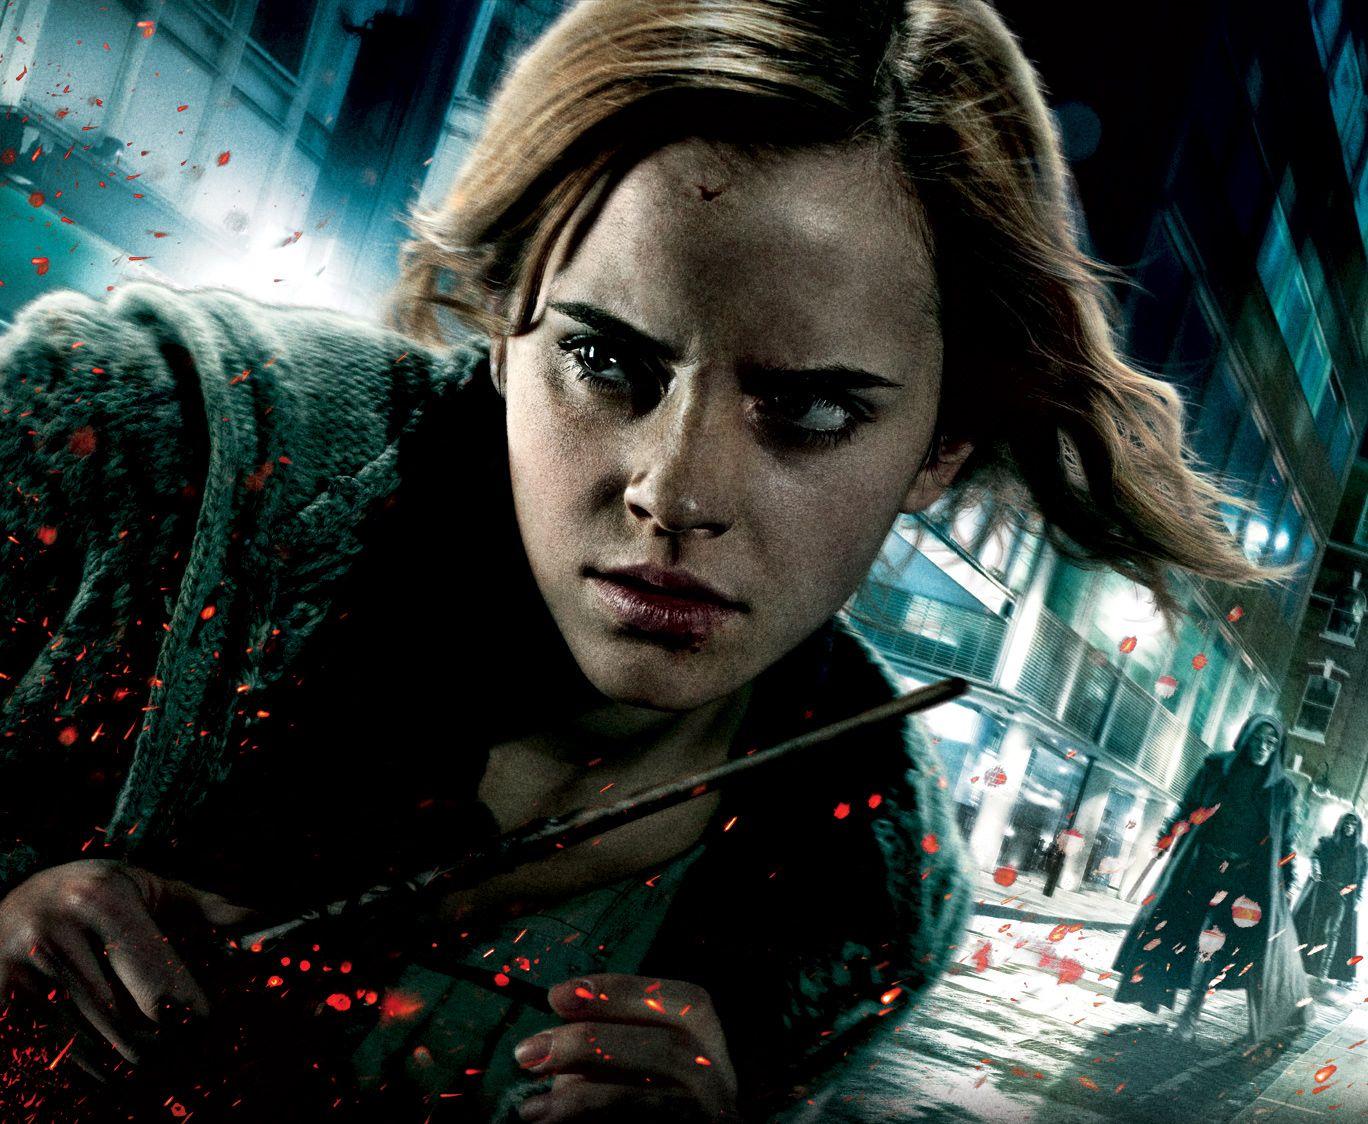 Must see Wallpaper Harry Potter Deathly Hallows - 76322f116e5a9d9a9717e3f3d7061518  Photograph_984350.jpg